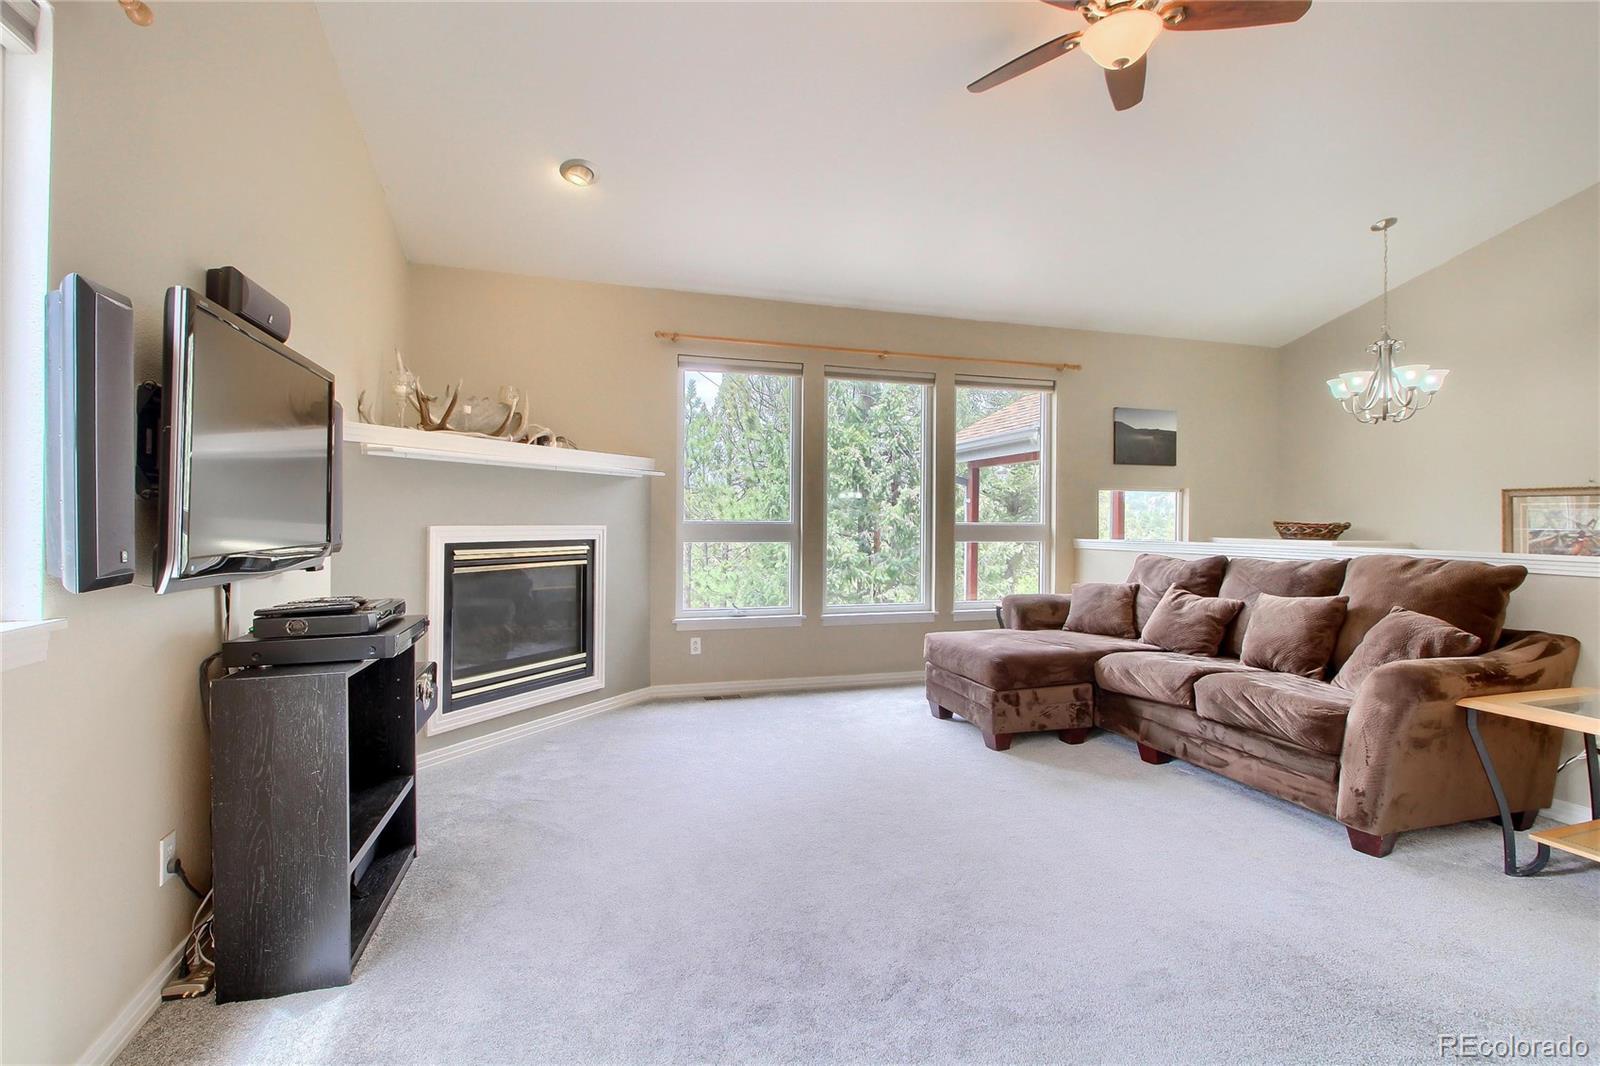 MLS# 7085048 - 8 - 15394 S Wandcrest Drive, Pine, CO 80470